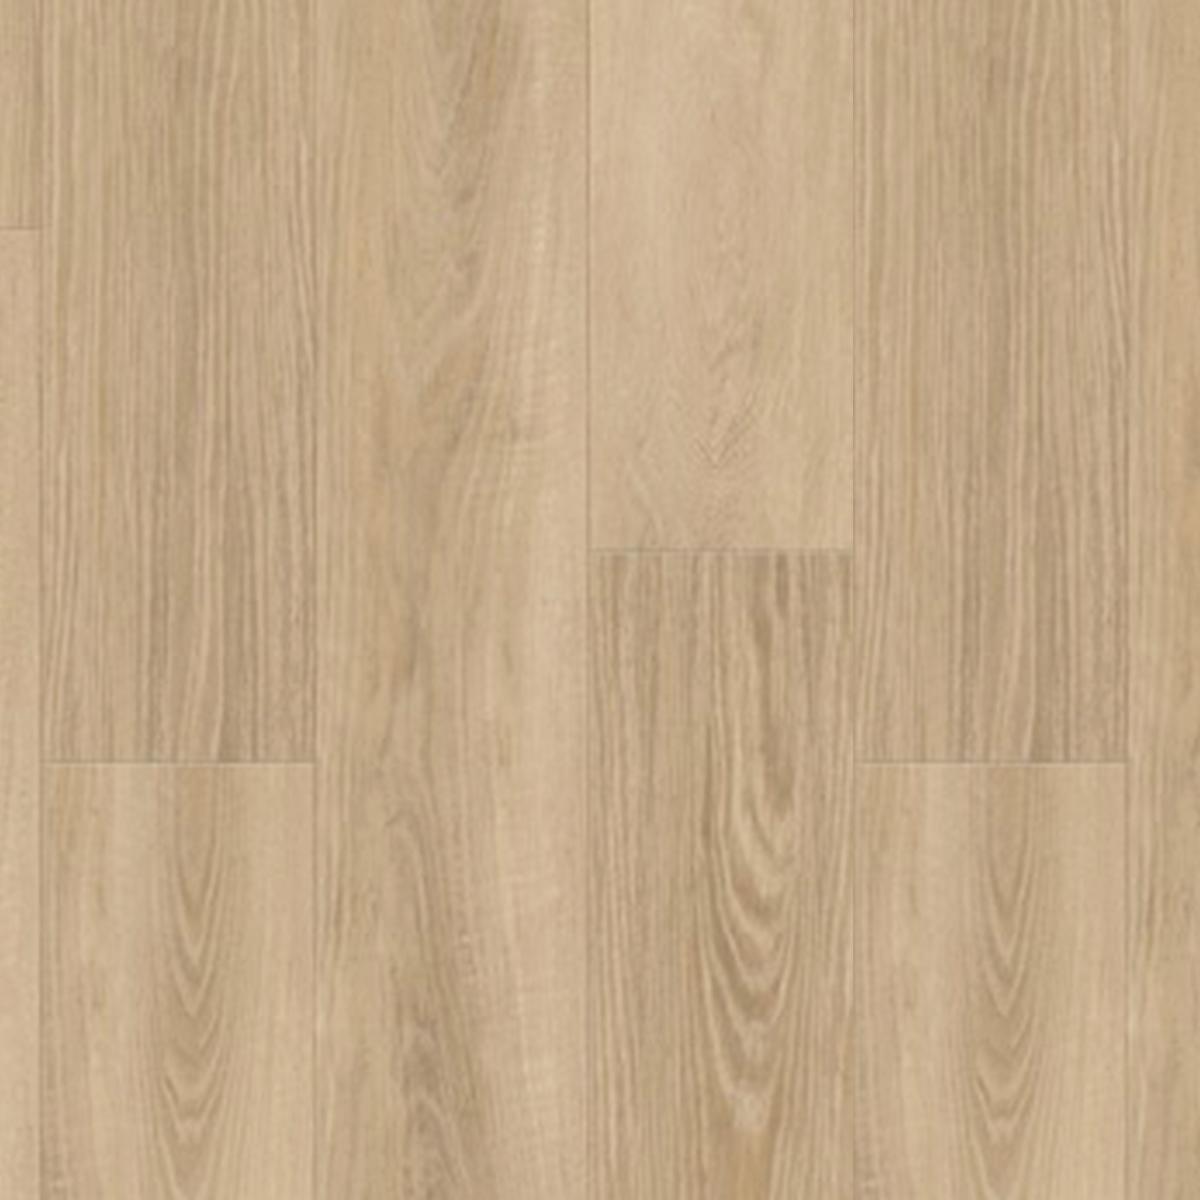 Pavimento PVC flottante clic+ Simba Sp 4.2 mm grigio / argento - 2